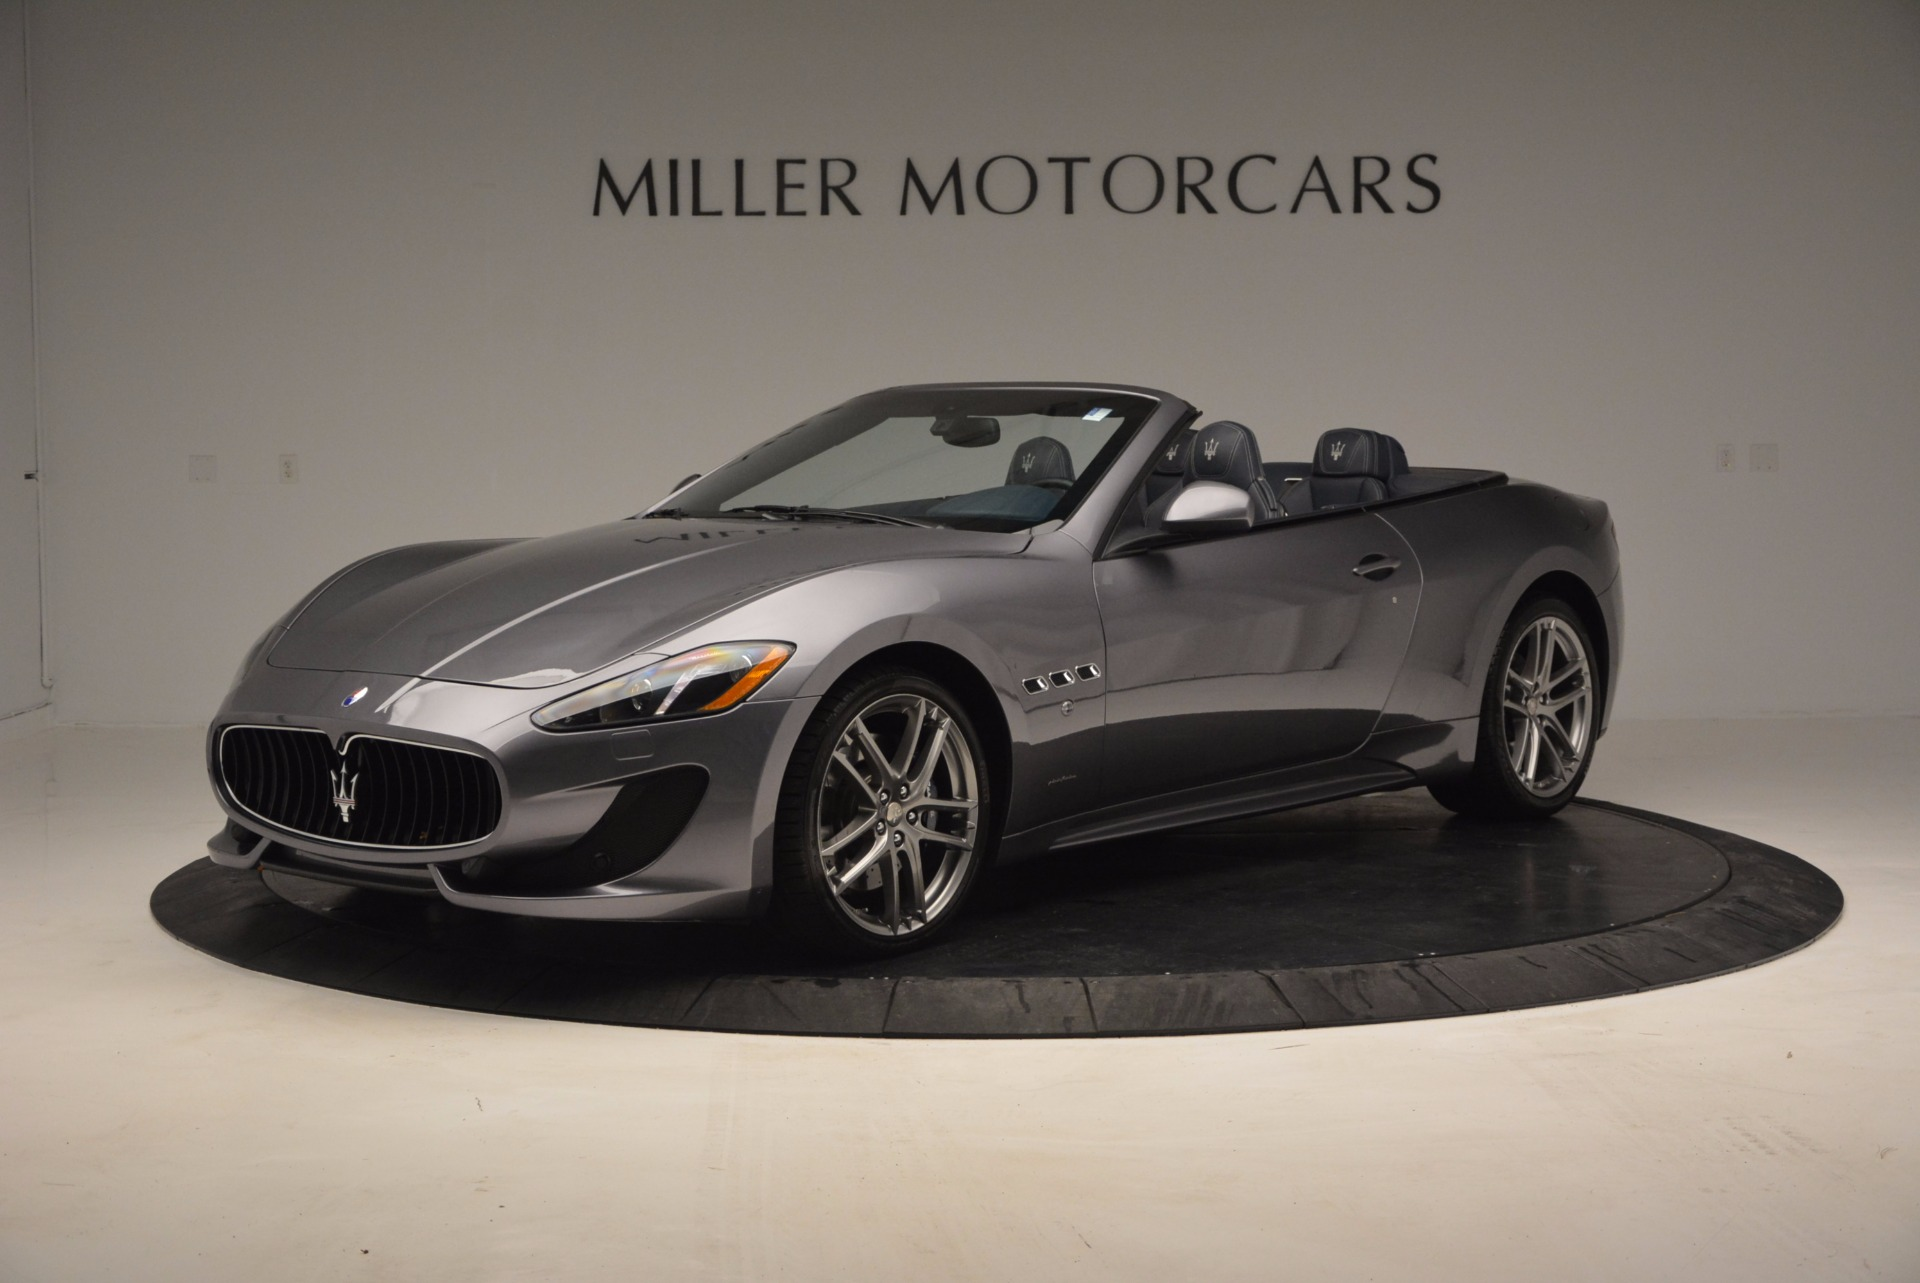 New 2016 Maserati GranTurismo Convertible Sport For Sale In Westport, CT 154_p3